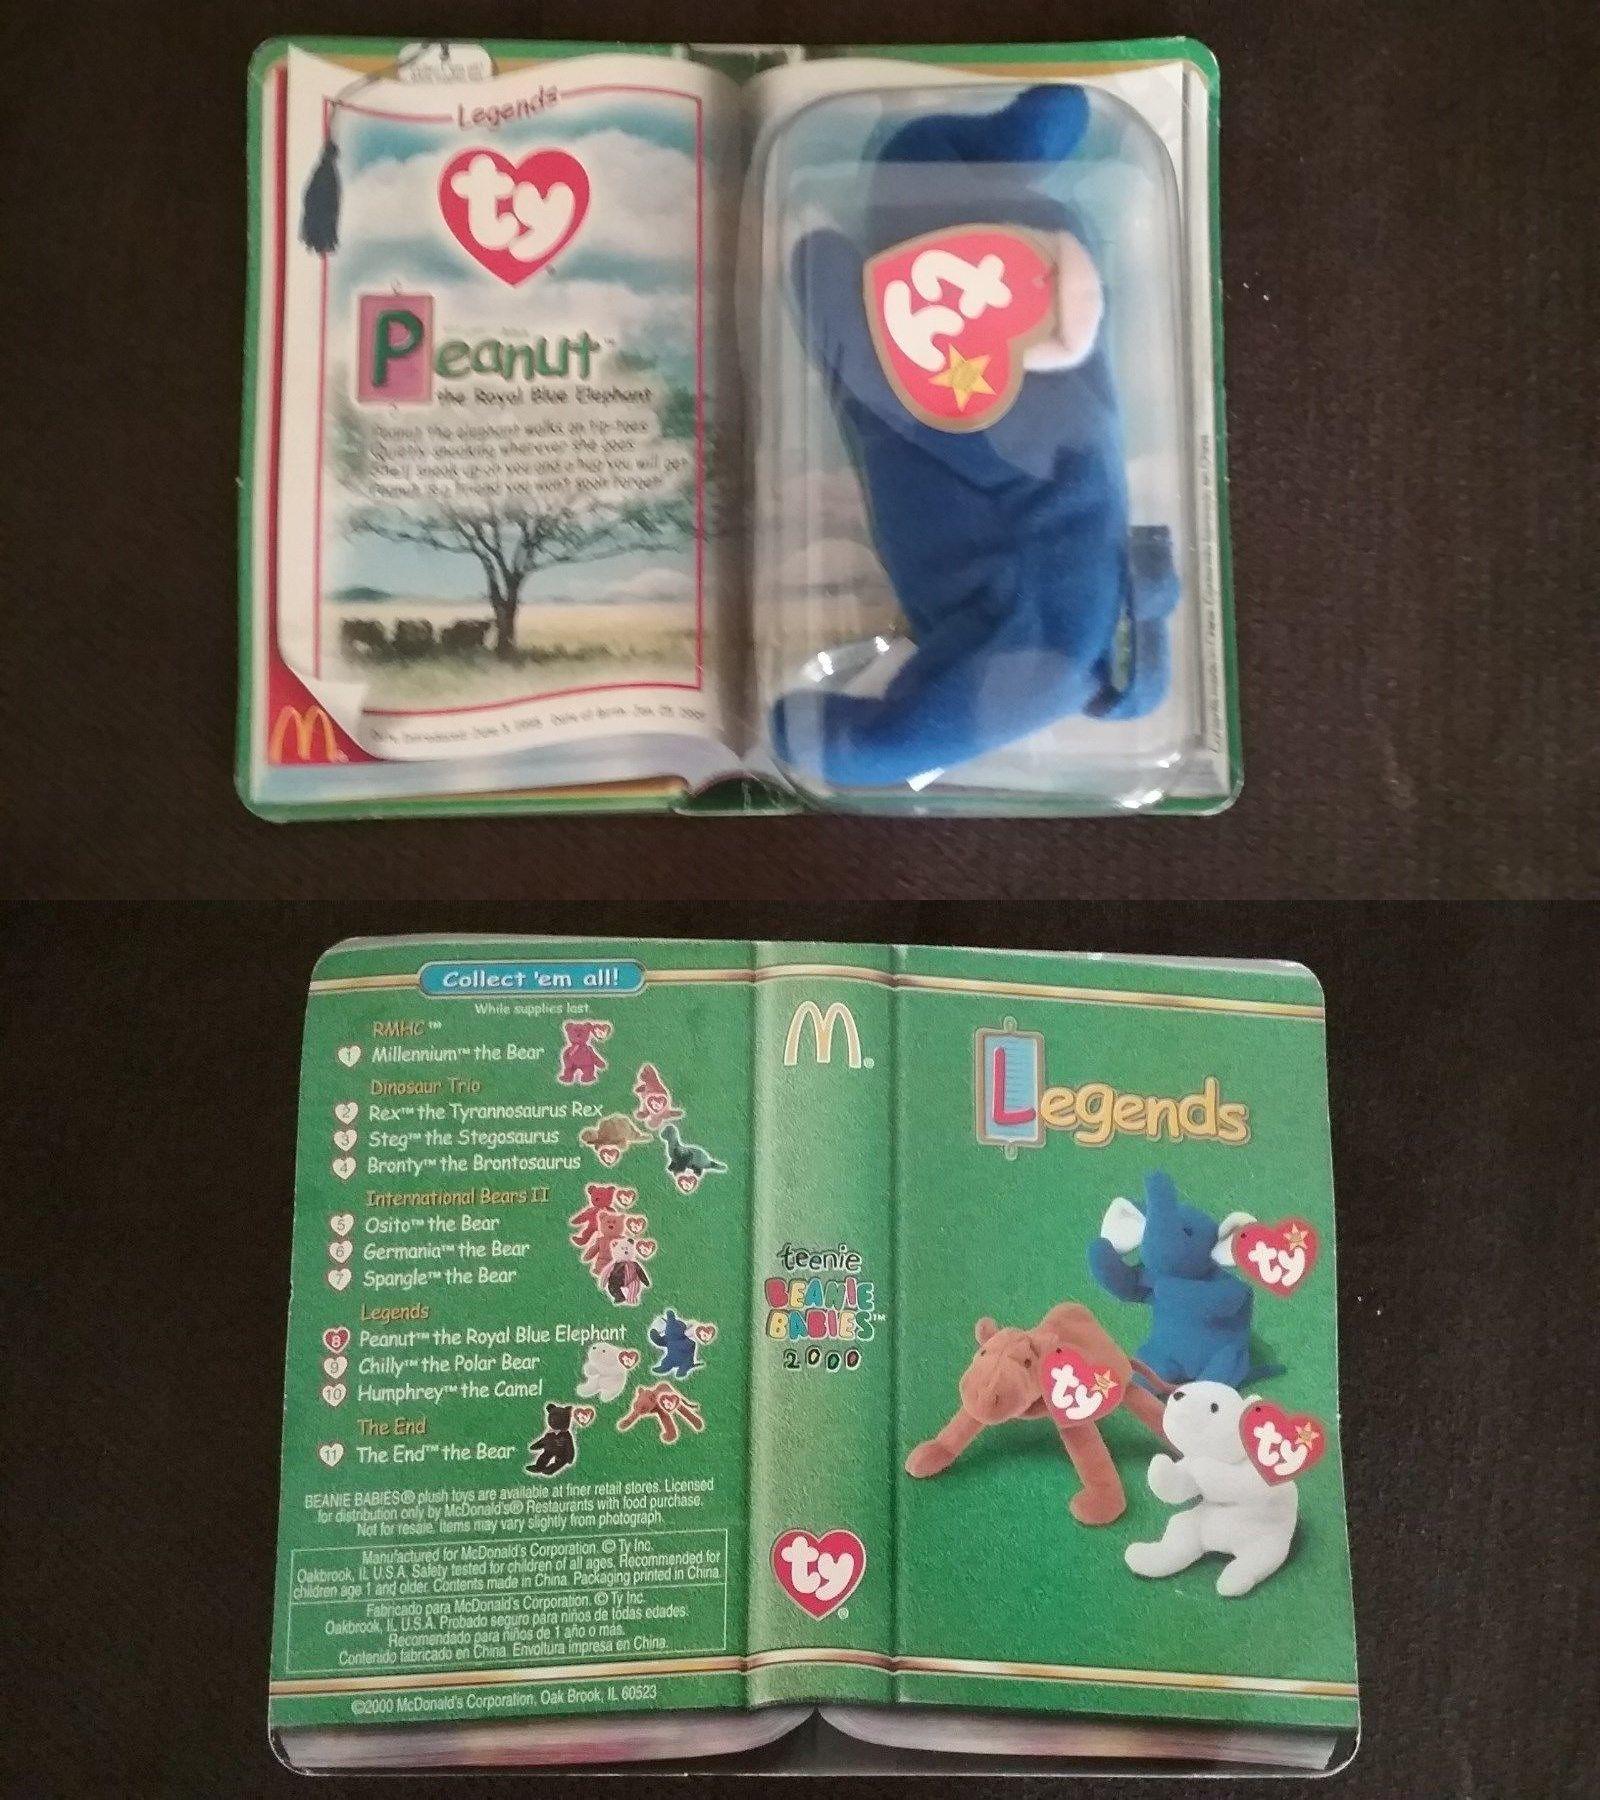 8b838a67584 Teenie Beanies 441  1998 Ty Teenie Beanie Baby - Peanut The Royal Blue  Elephant Nib